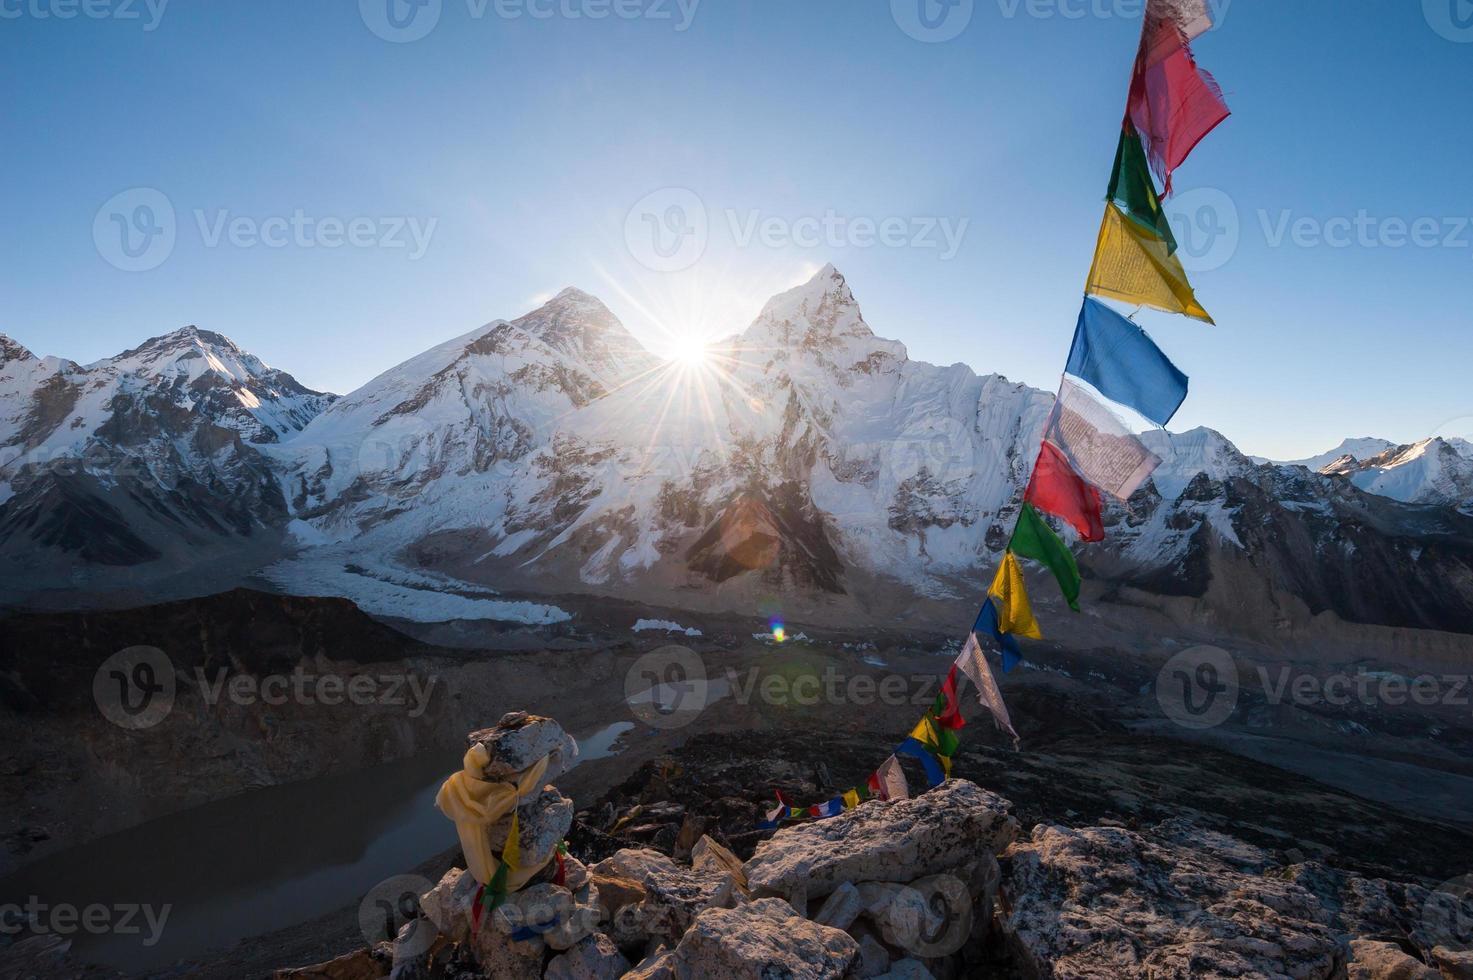 Mt.Everest at sunrise from Kala Patthar summit, Nepal photo